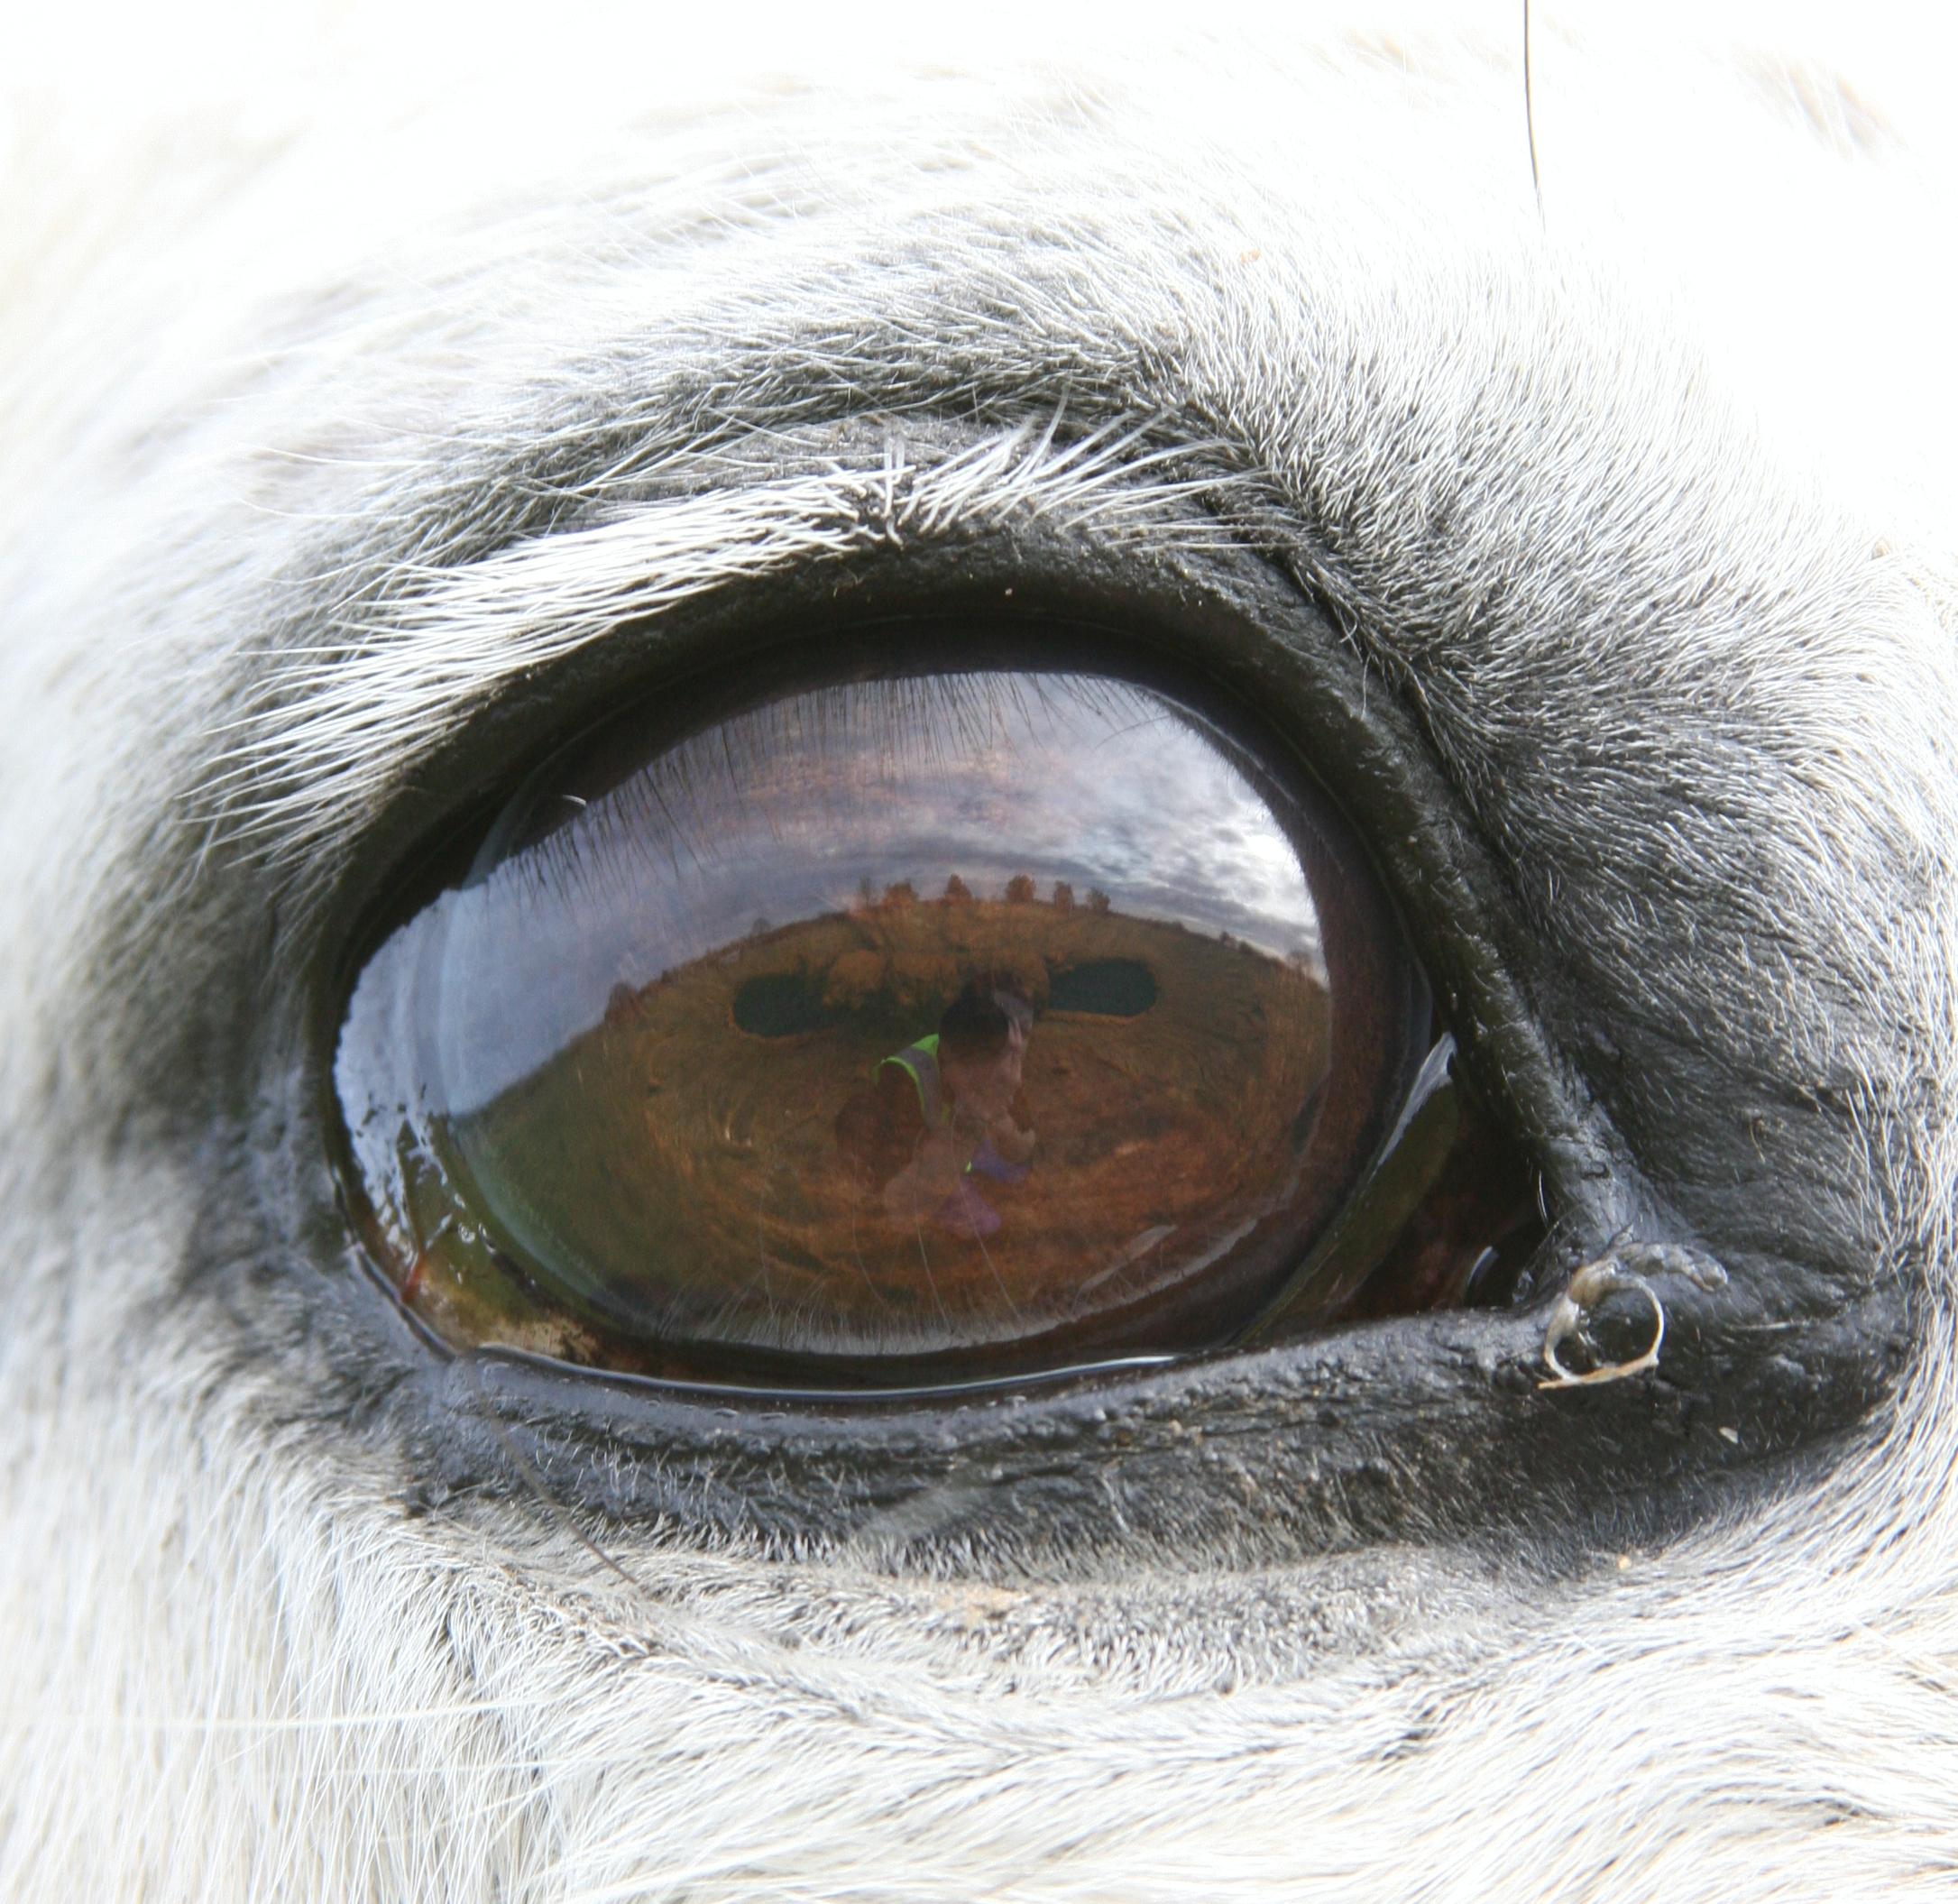 File:Grey horse eye.jpg